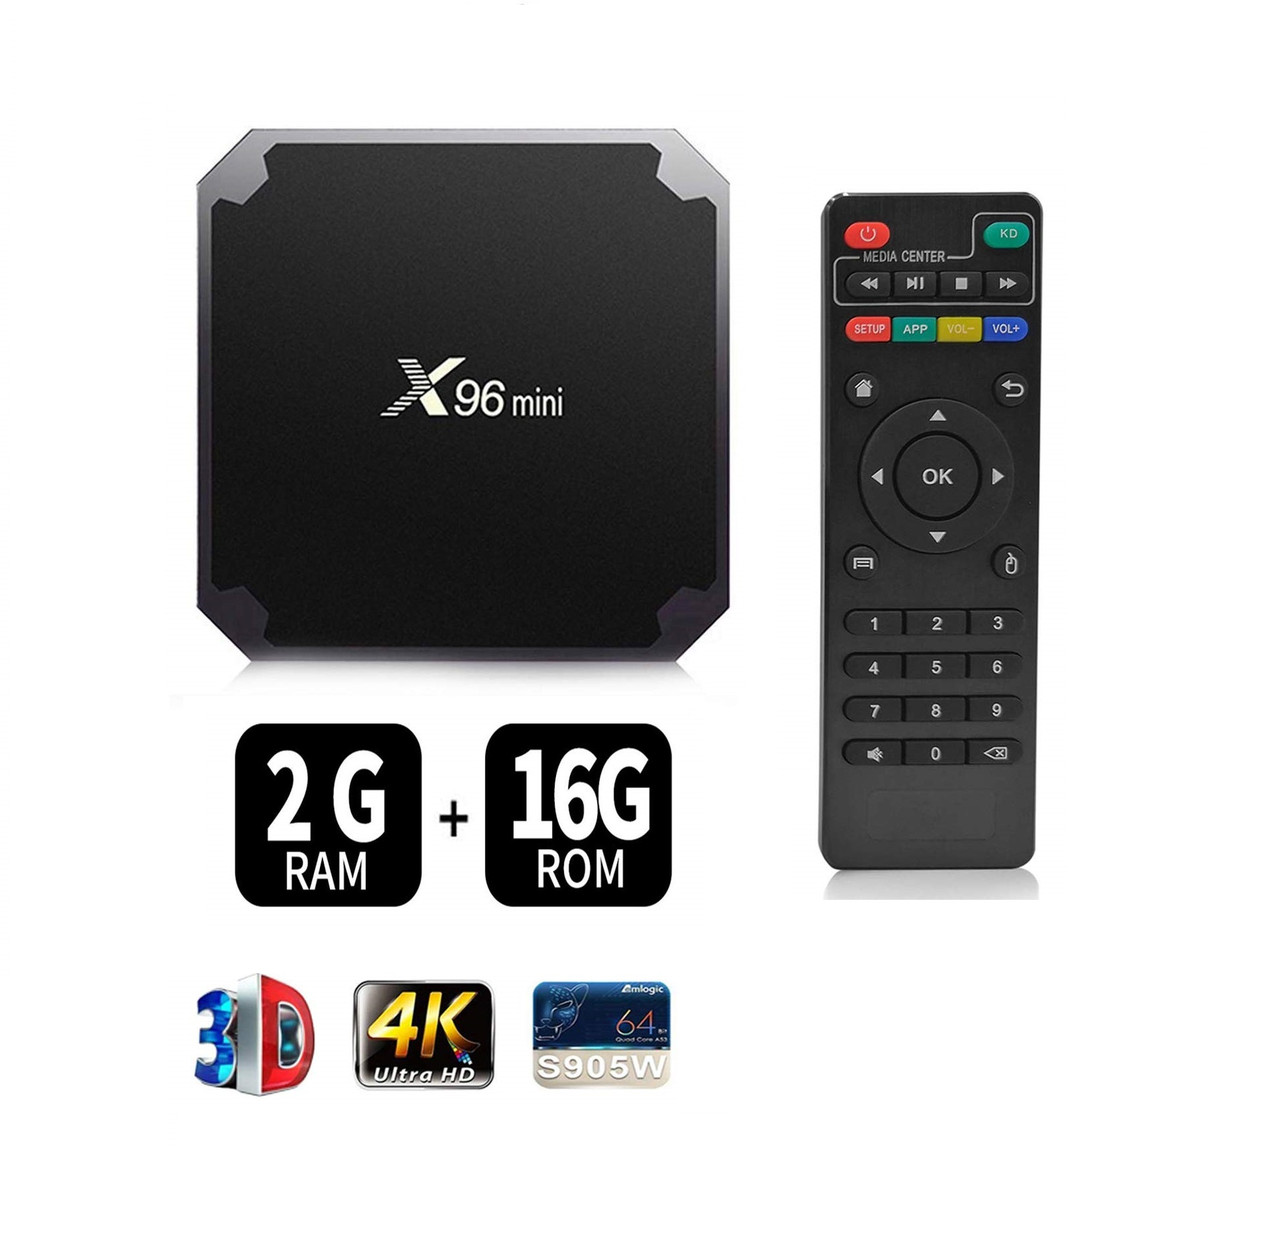 Медиаплеер Android TV Box X96 Mini, 2gb + 16gb, HDMI, WiFi, воспроизведение в формате 4K, пульт управления